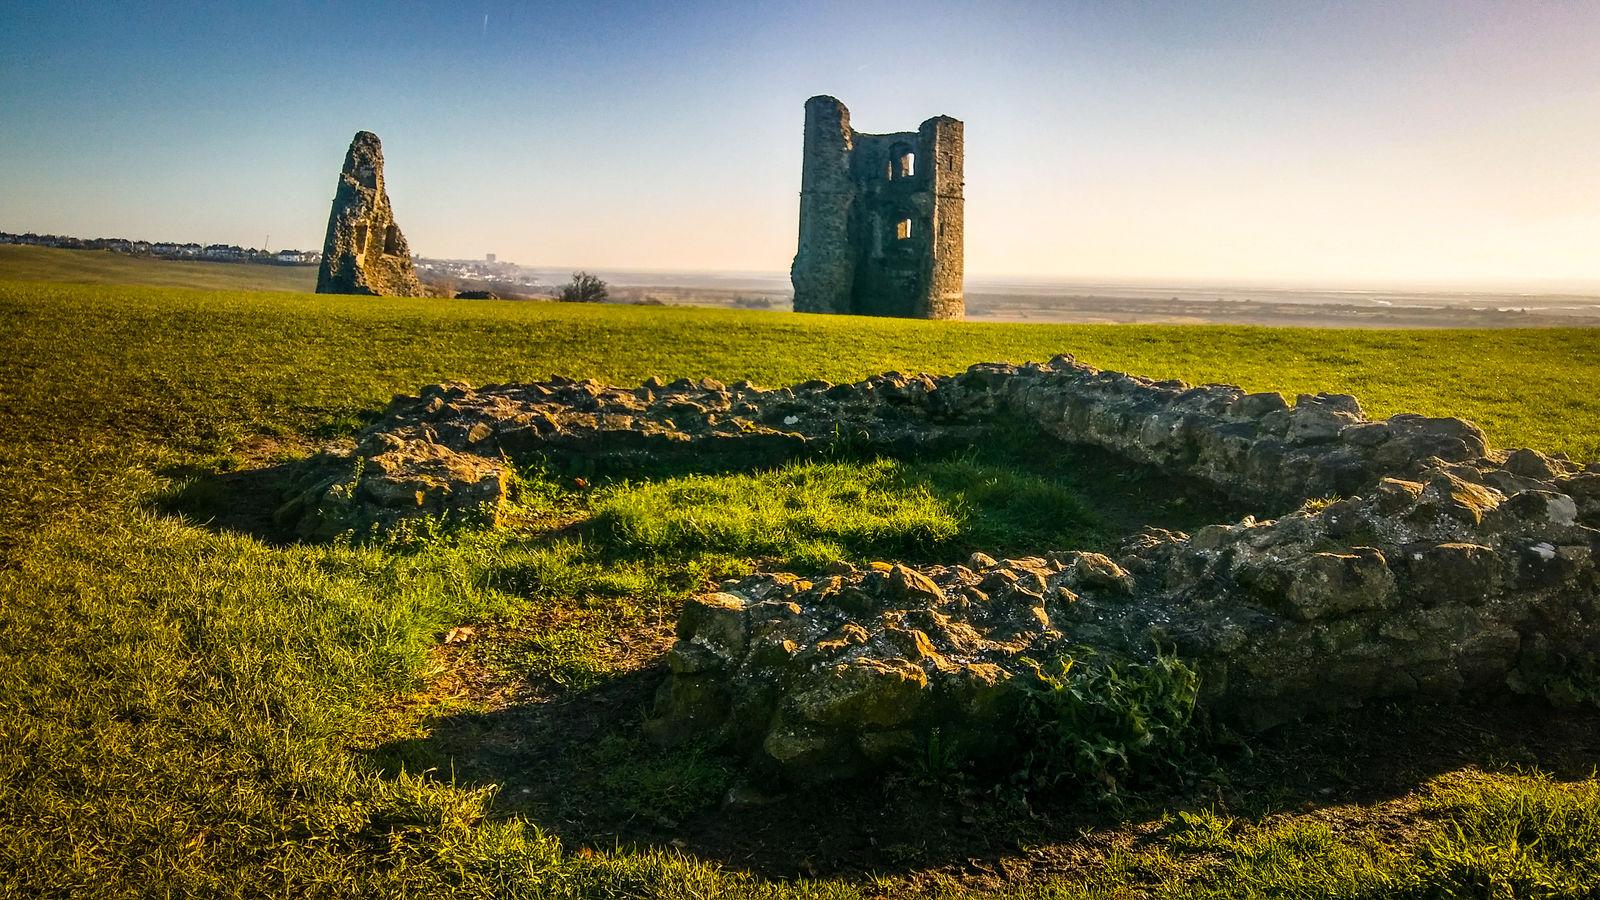 Architecture Travel Destinations No People Outdoors Day Cultures Castle Ruins Of A Castle Celtic